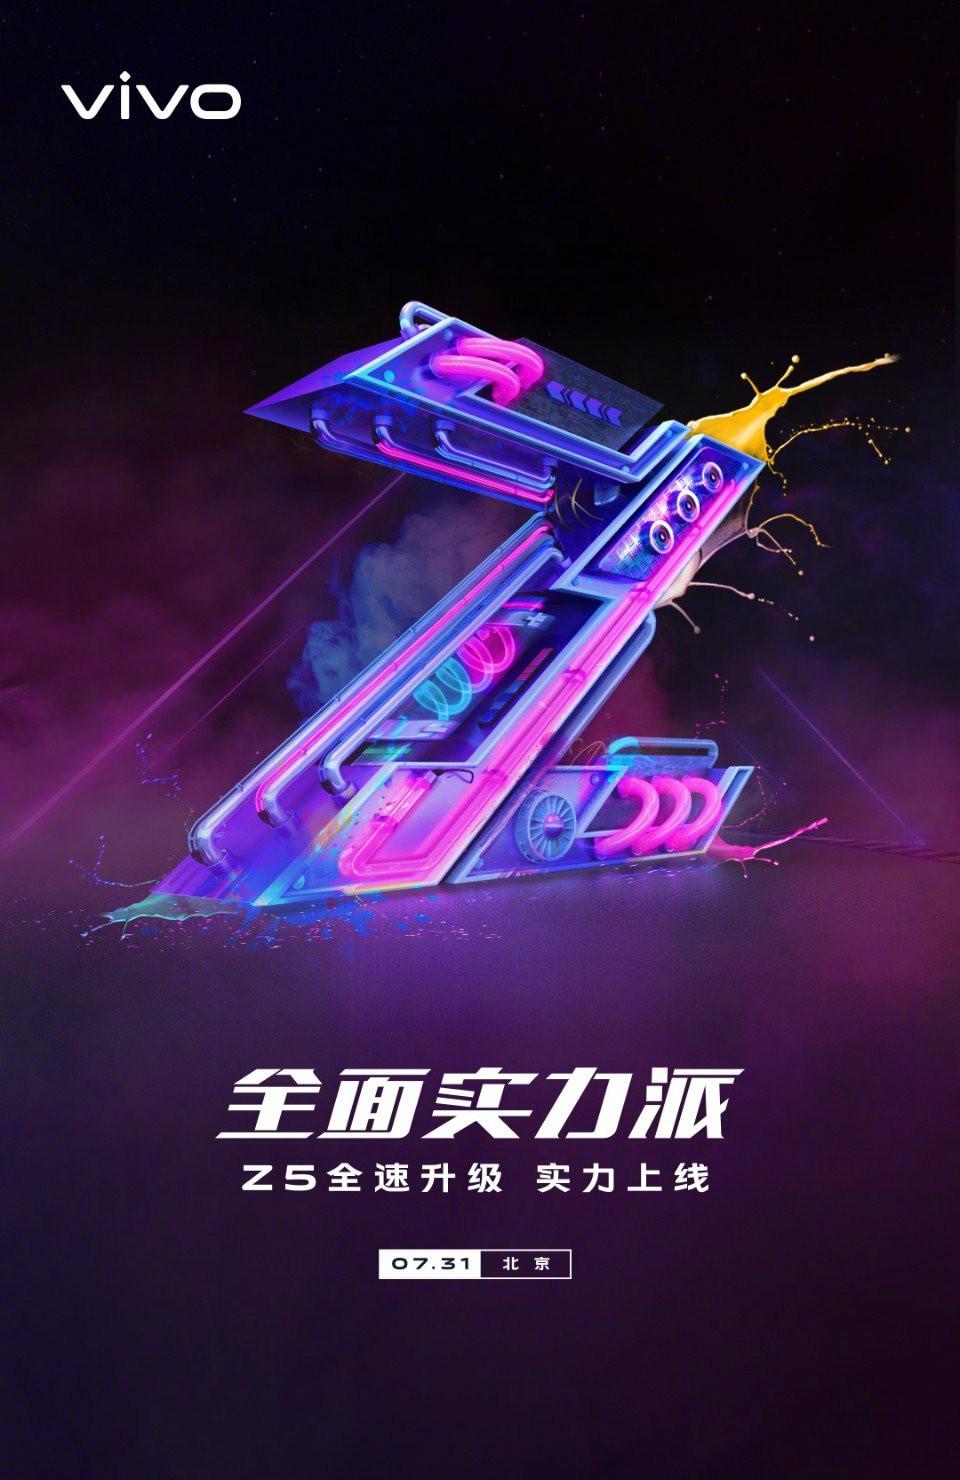 Vivo Z5 Release Date